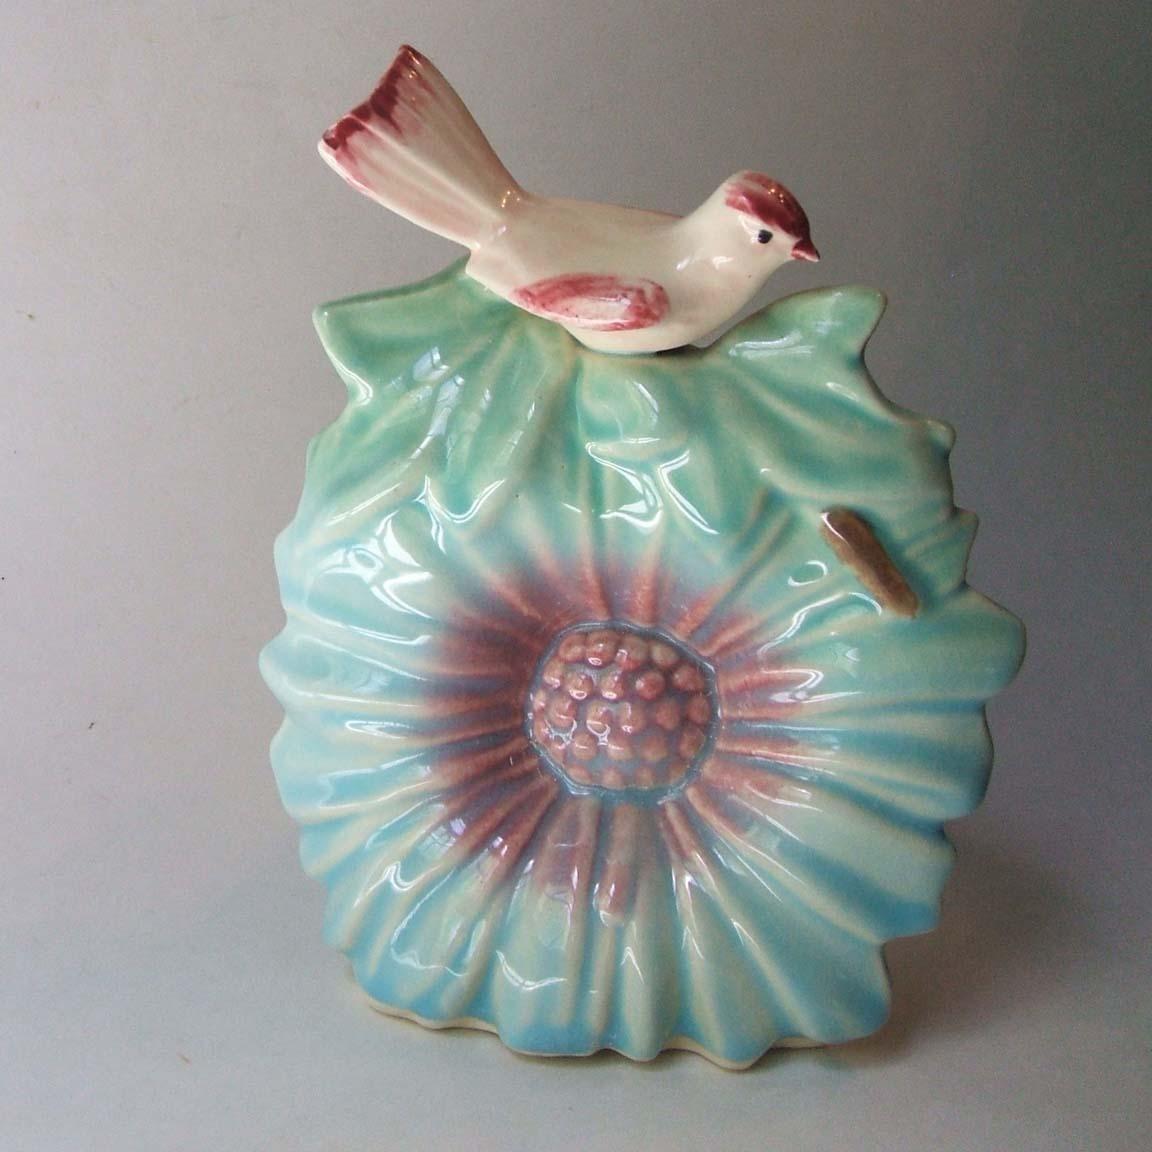 antique wall pocket vases of vintage mccoy pottery bird on sunflower wall pocket vase white bird regarding vintage mccoy pottery bird on sunflower wall pocket vase white bird blue flower